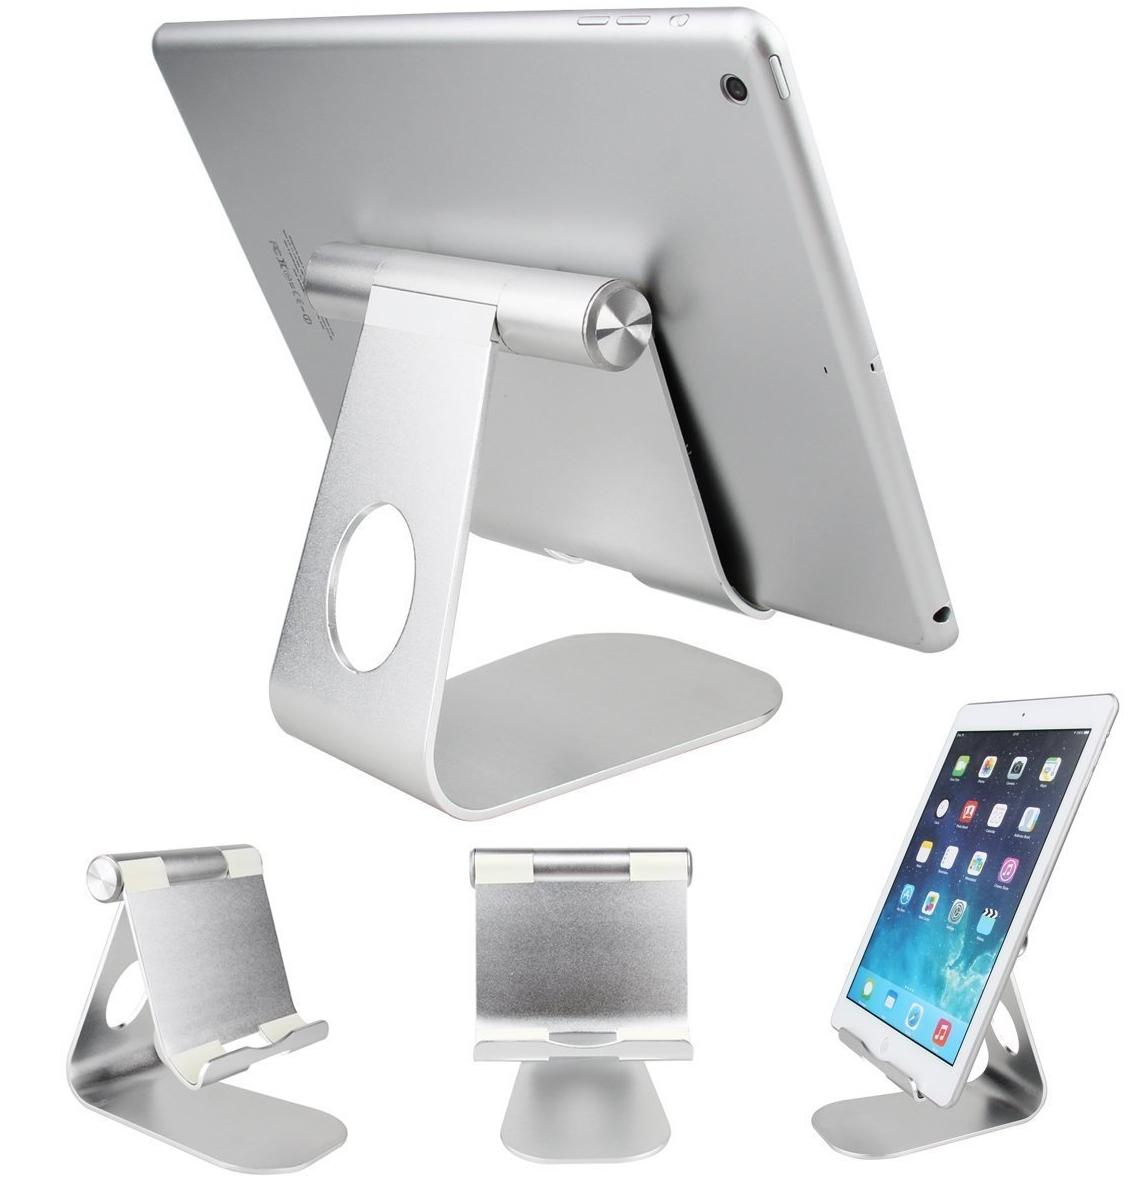 Verstellbarer Tablet-Ständer aus silbernem Aluminium für iPad, Tablet-PC, E-Book-Reader & Co